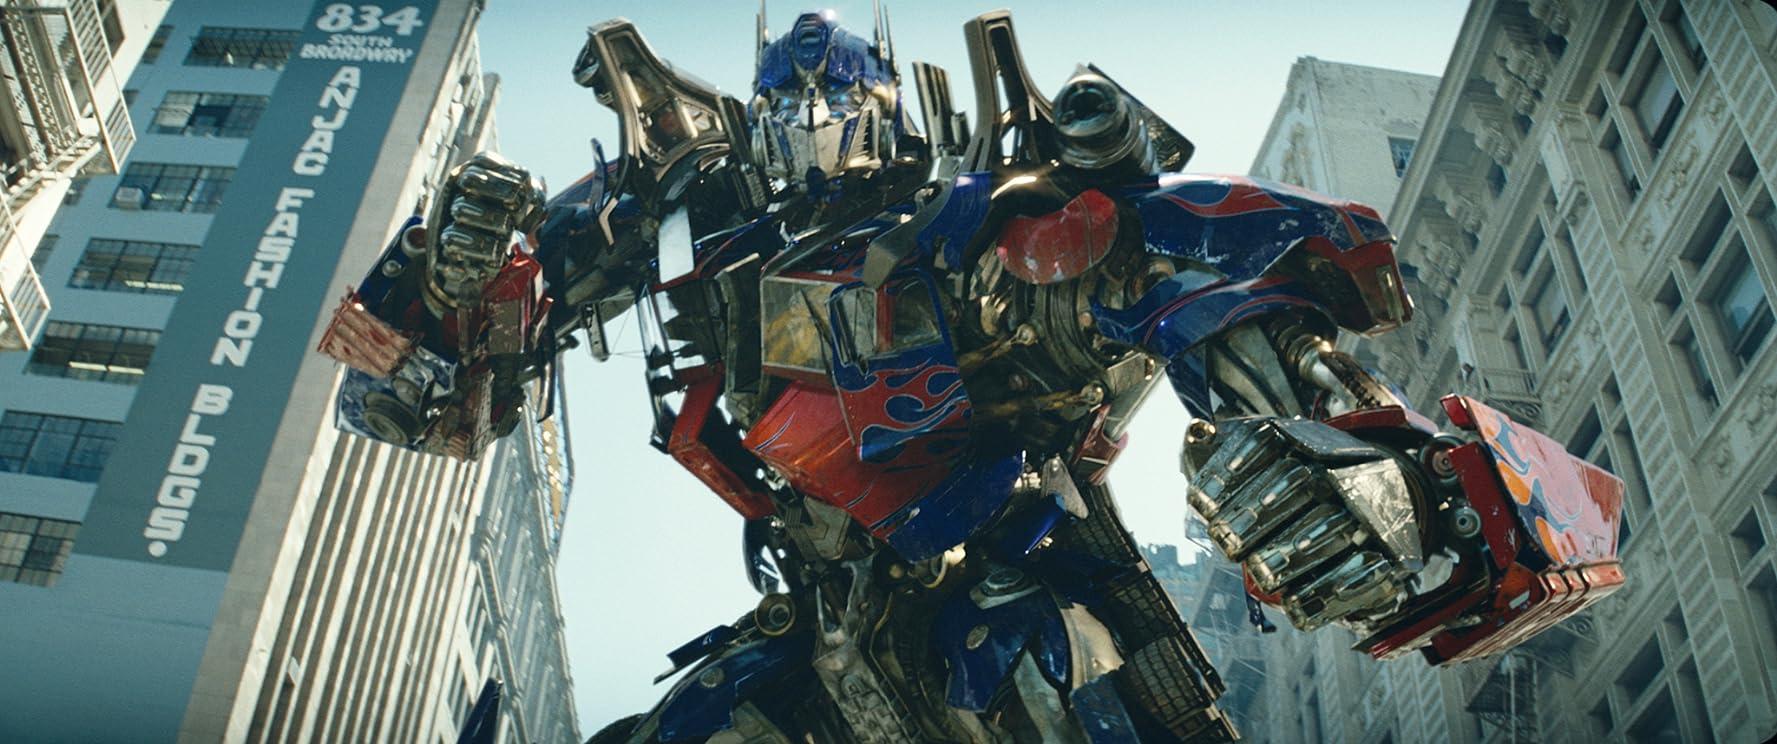 Peter Cullen in Transformers (2007)